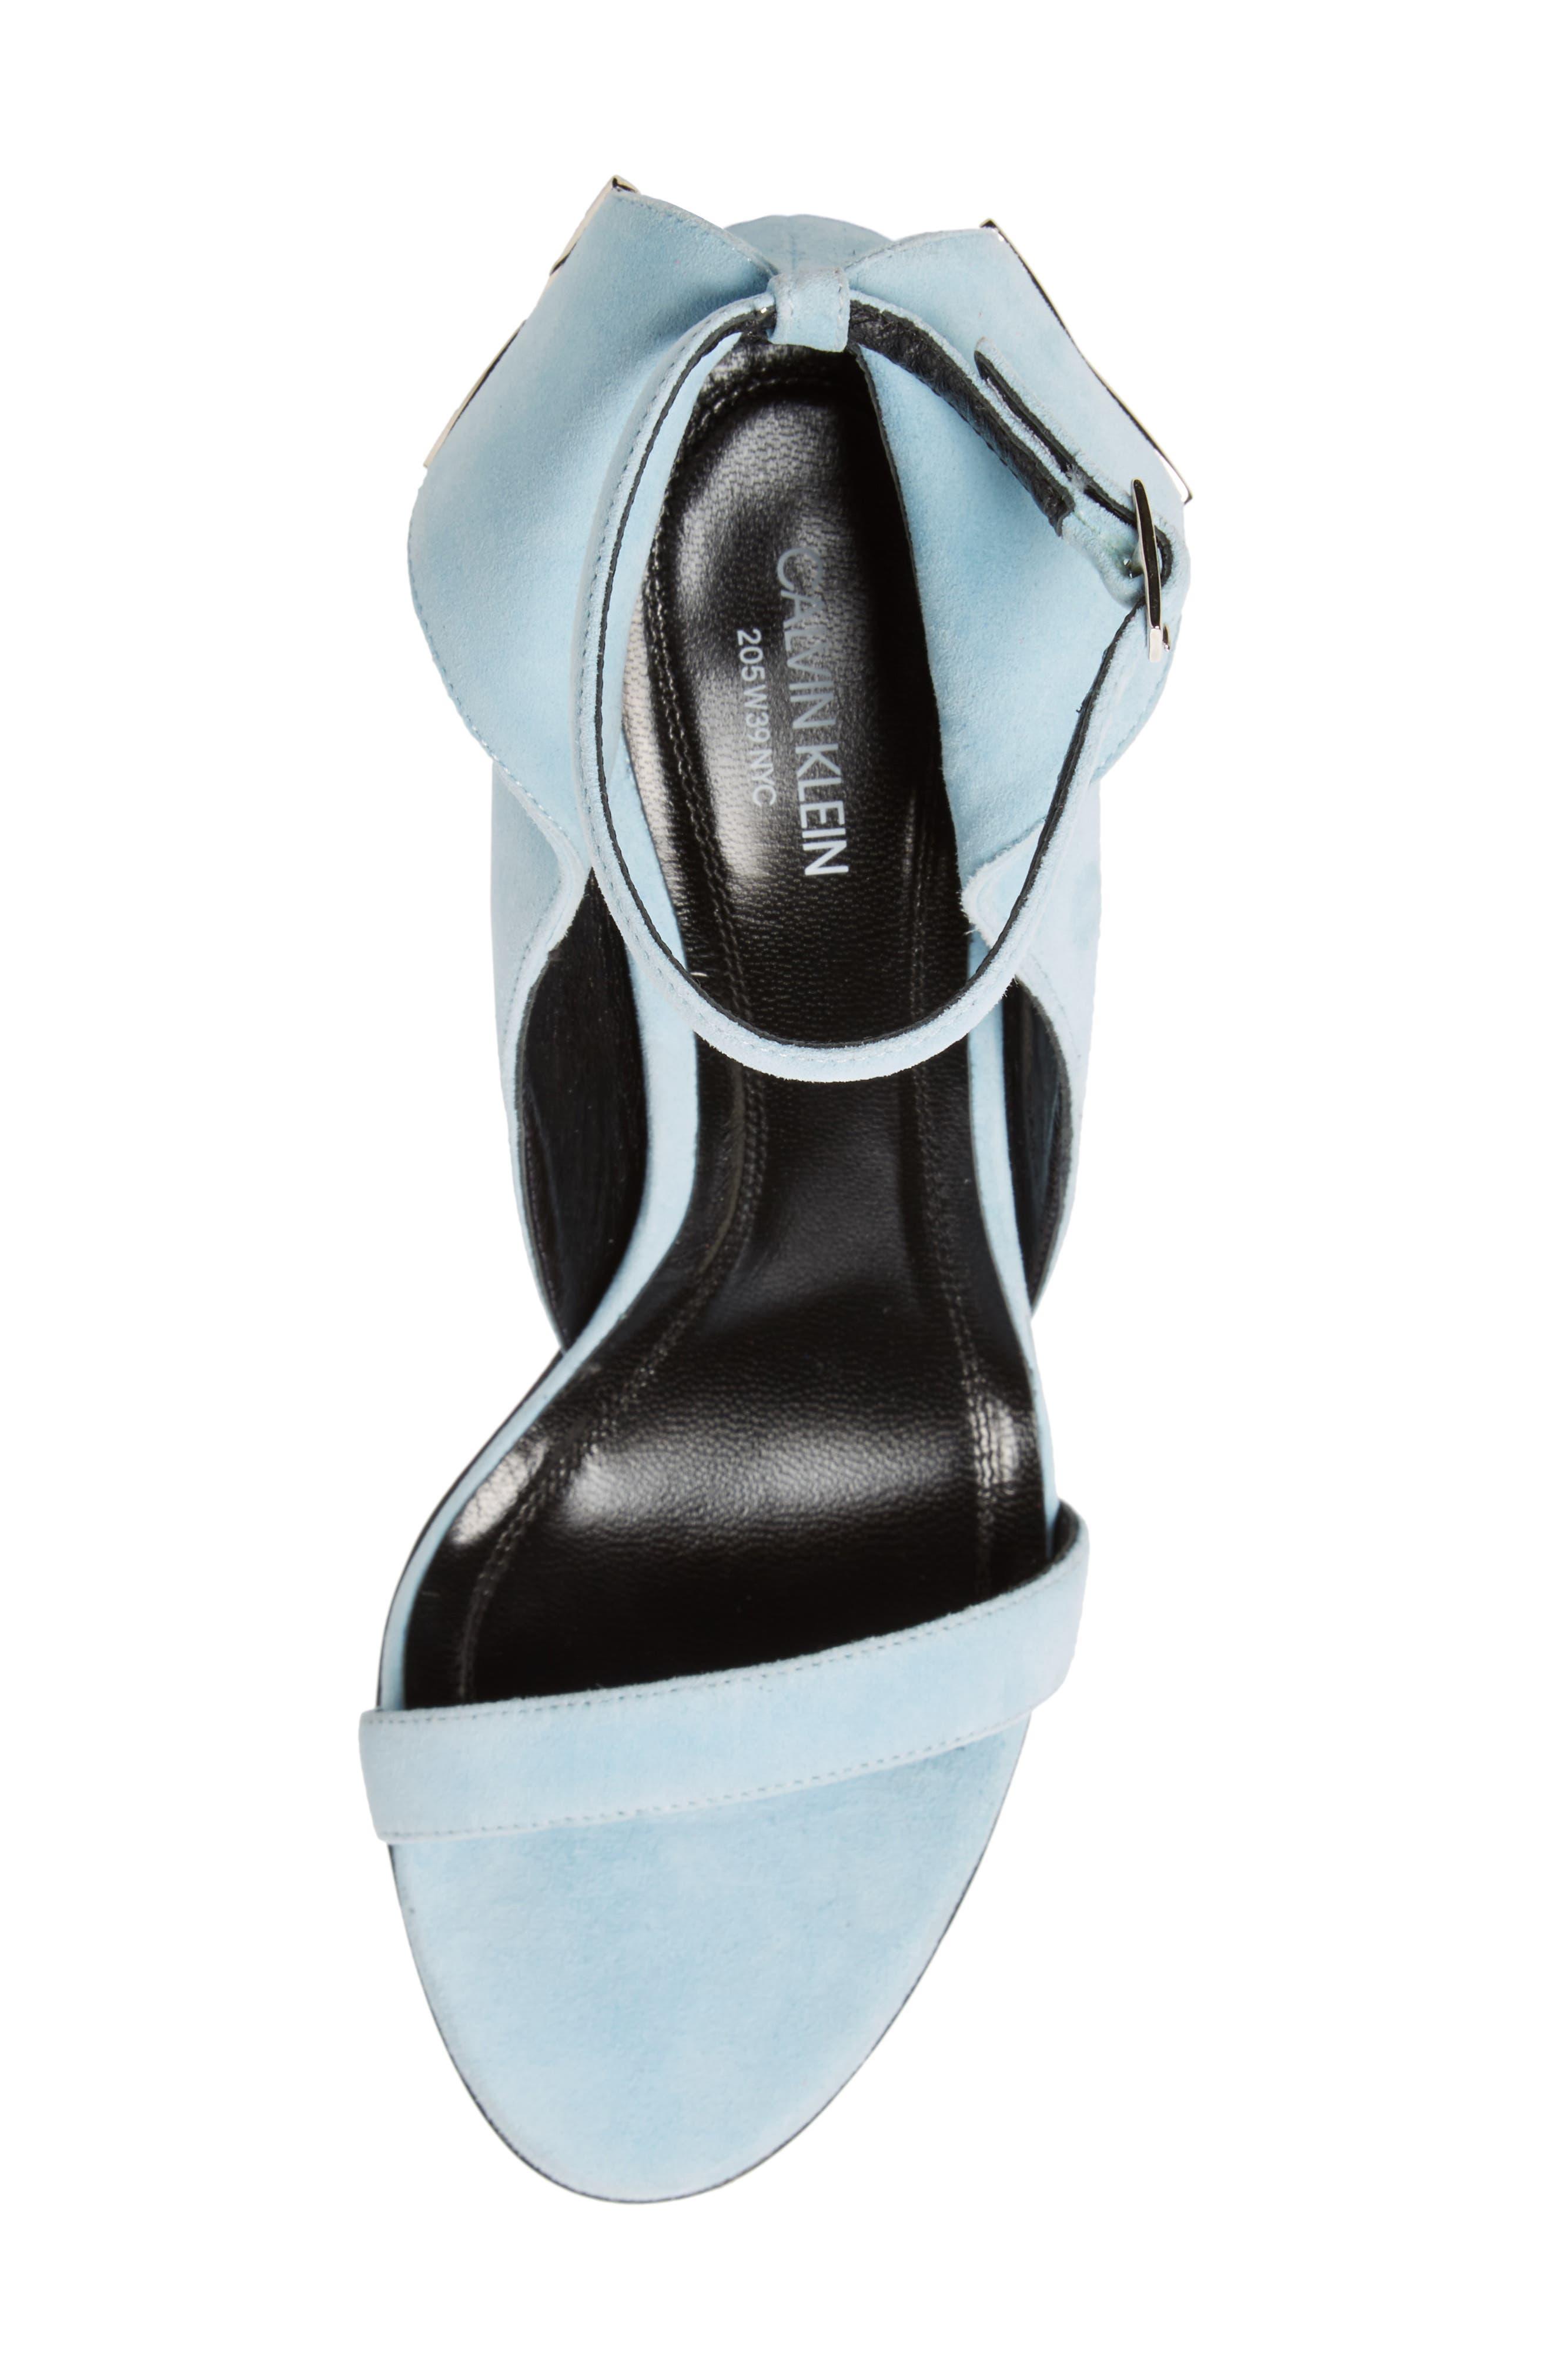 Leititia Ankle Strap Sandal,                             Alternate thumbnail 5, color,                             400